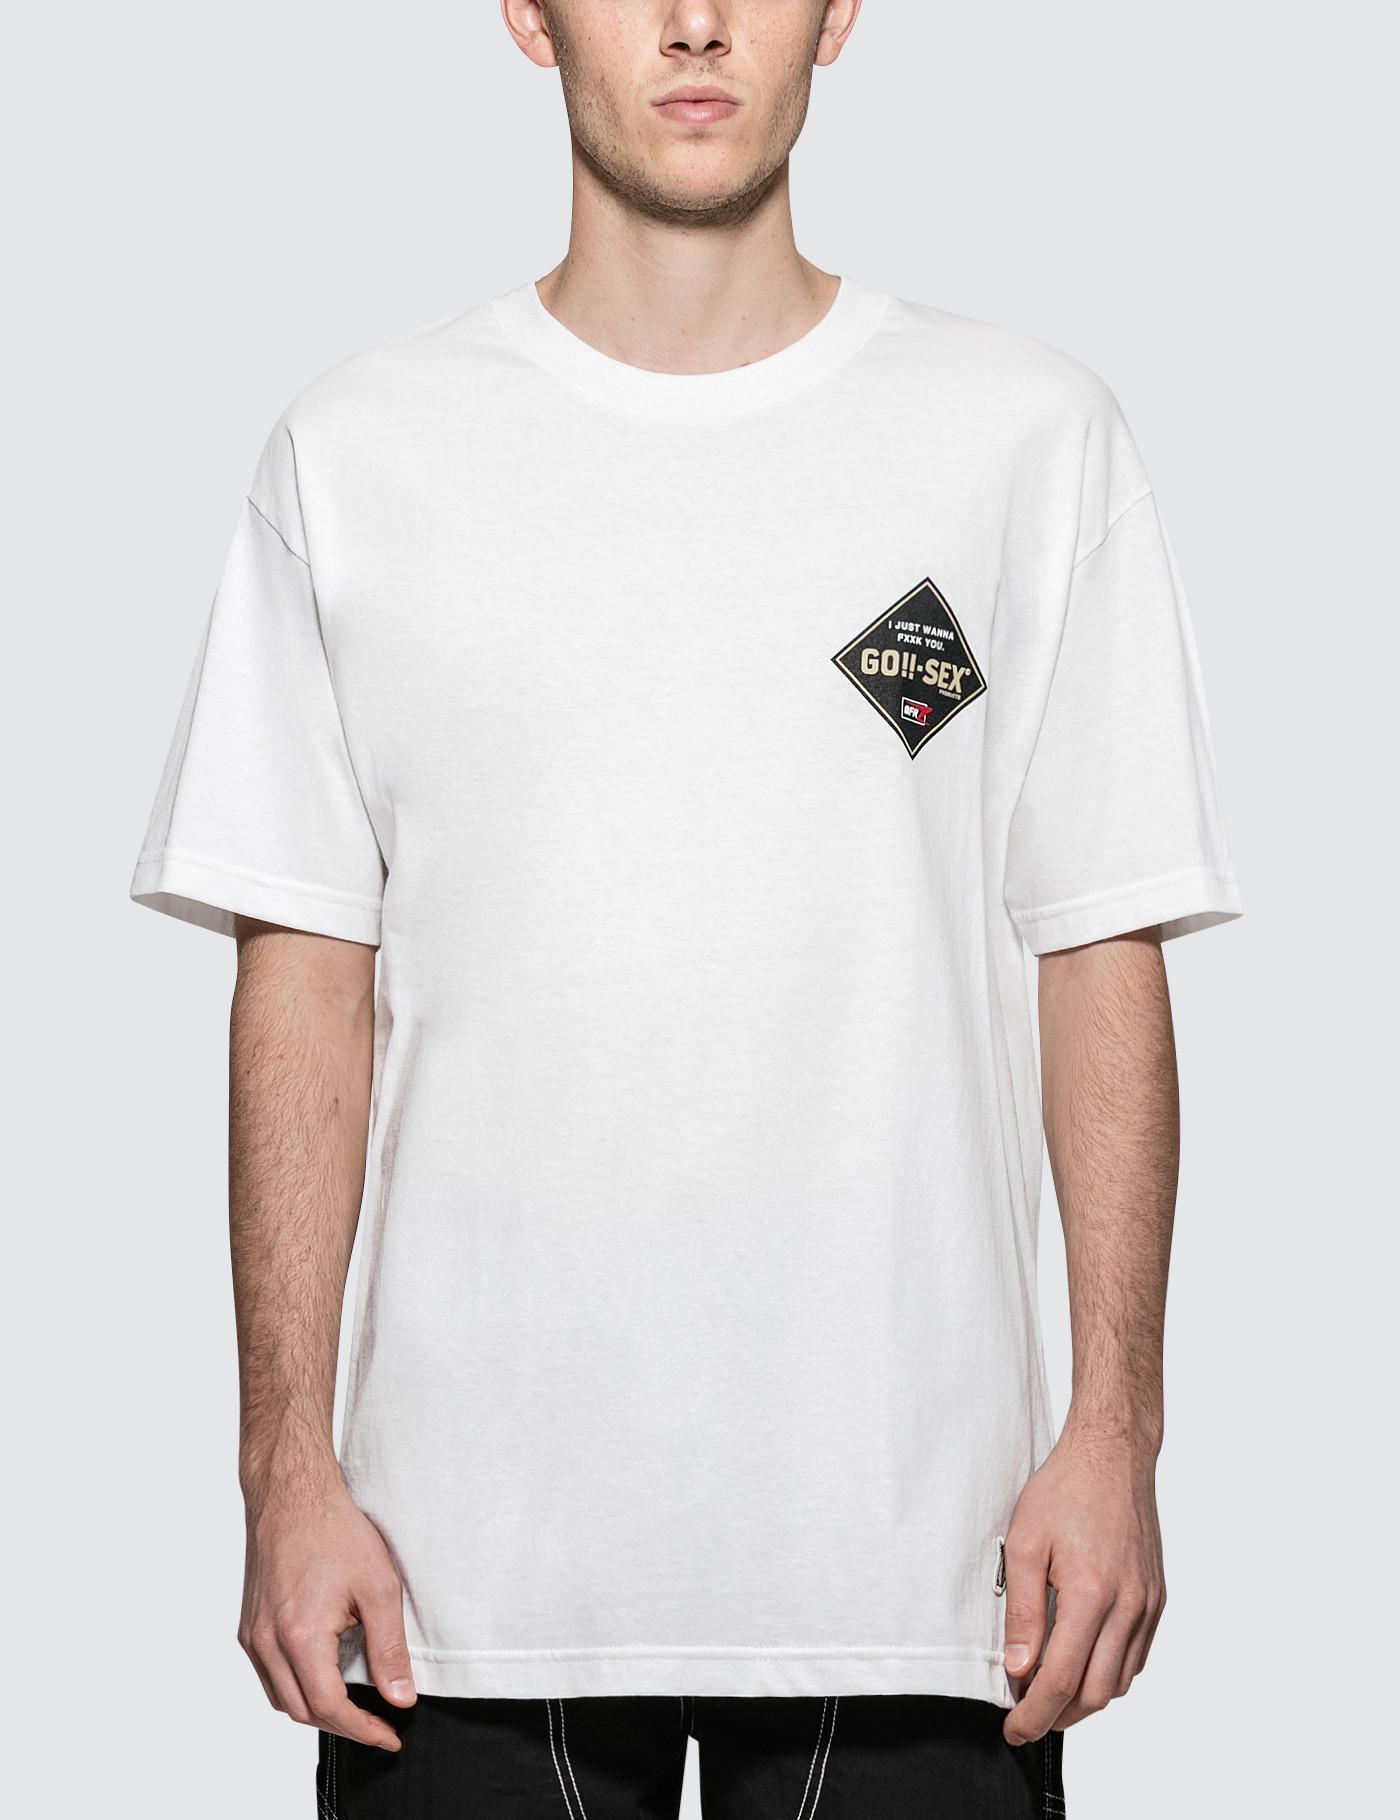 ae0773379df Lyst -  FR2 Go-sex S s T-shirt in White for Men